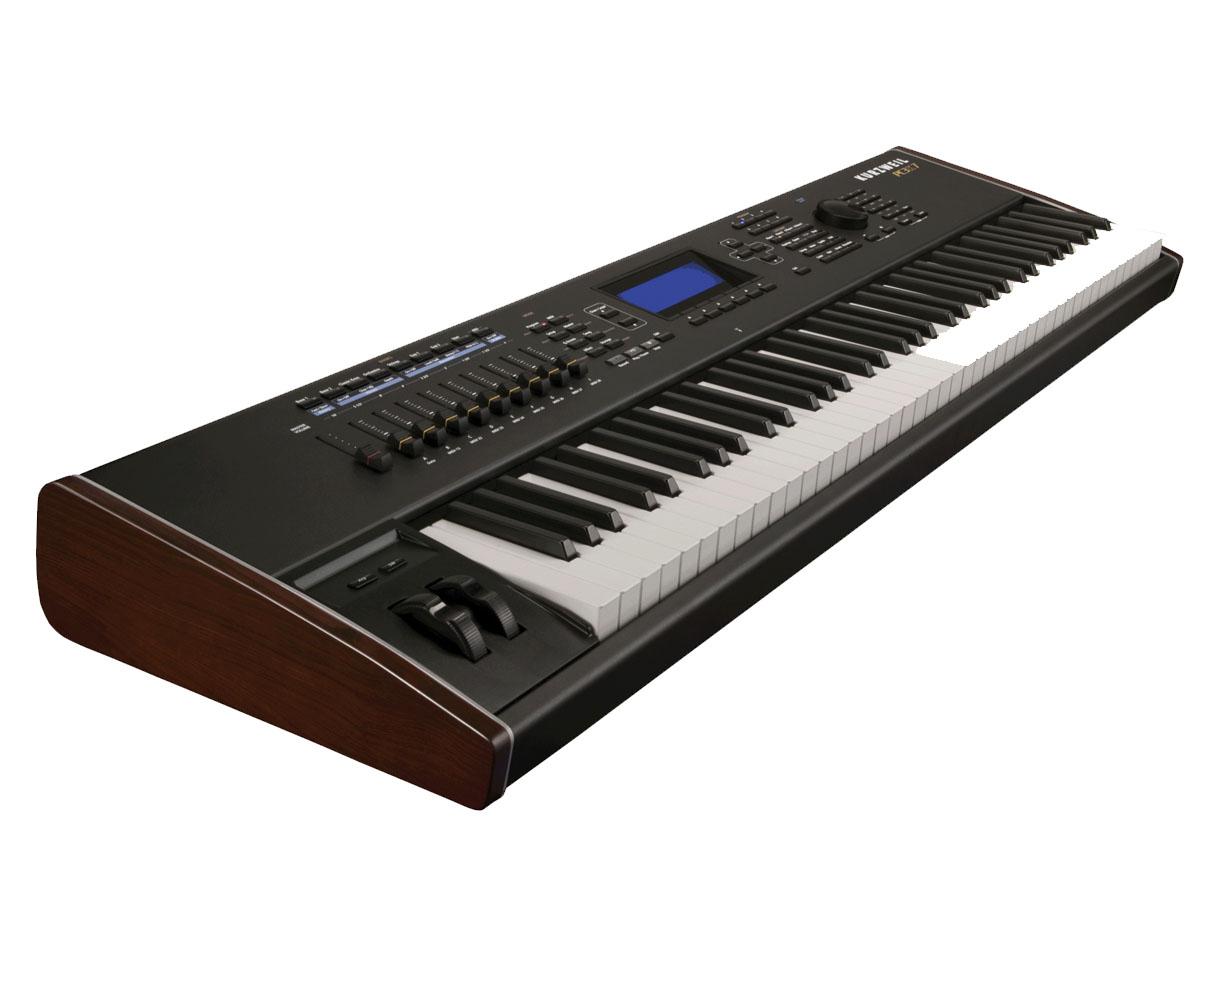 kurzweil pc3k7 pc3 k7 76 key controller key board keyboard proaudiostar ebay. Black Bedroom Furniture Sets. Home Design Ideas